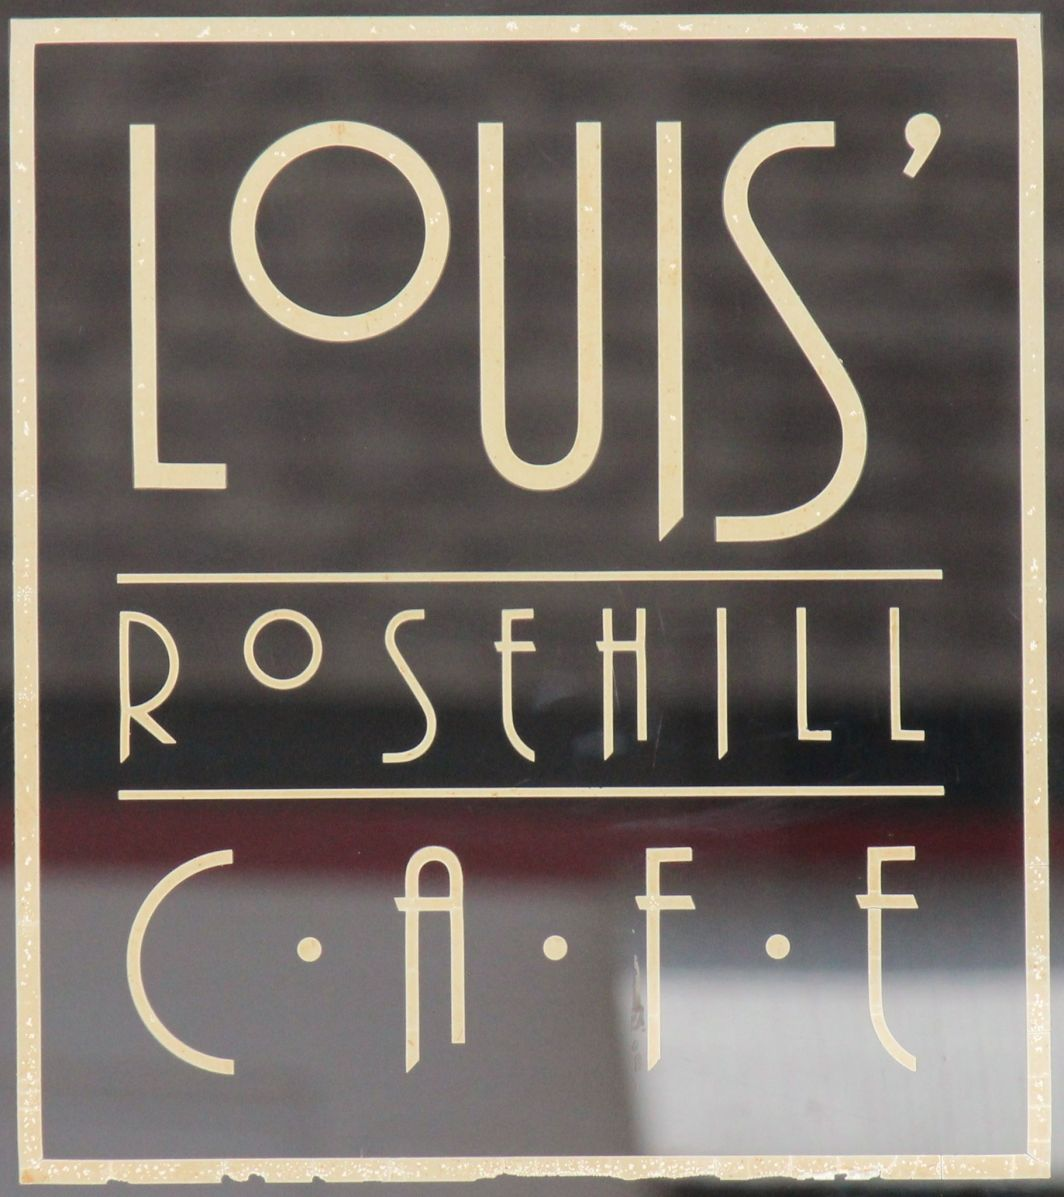 Louis Rose Hill Cafe 107 S Rose Hill Rd Rose Hill, Kansas 67133